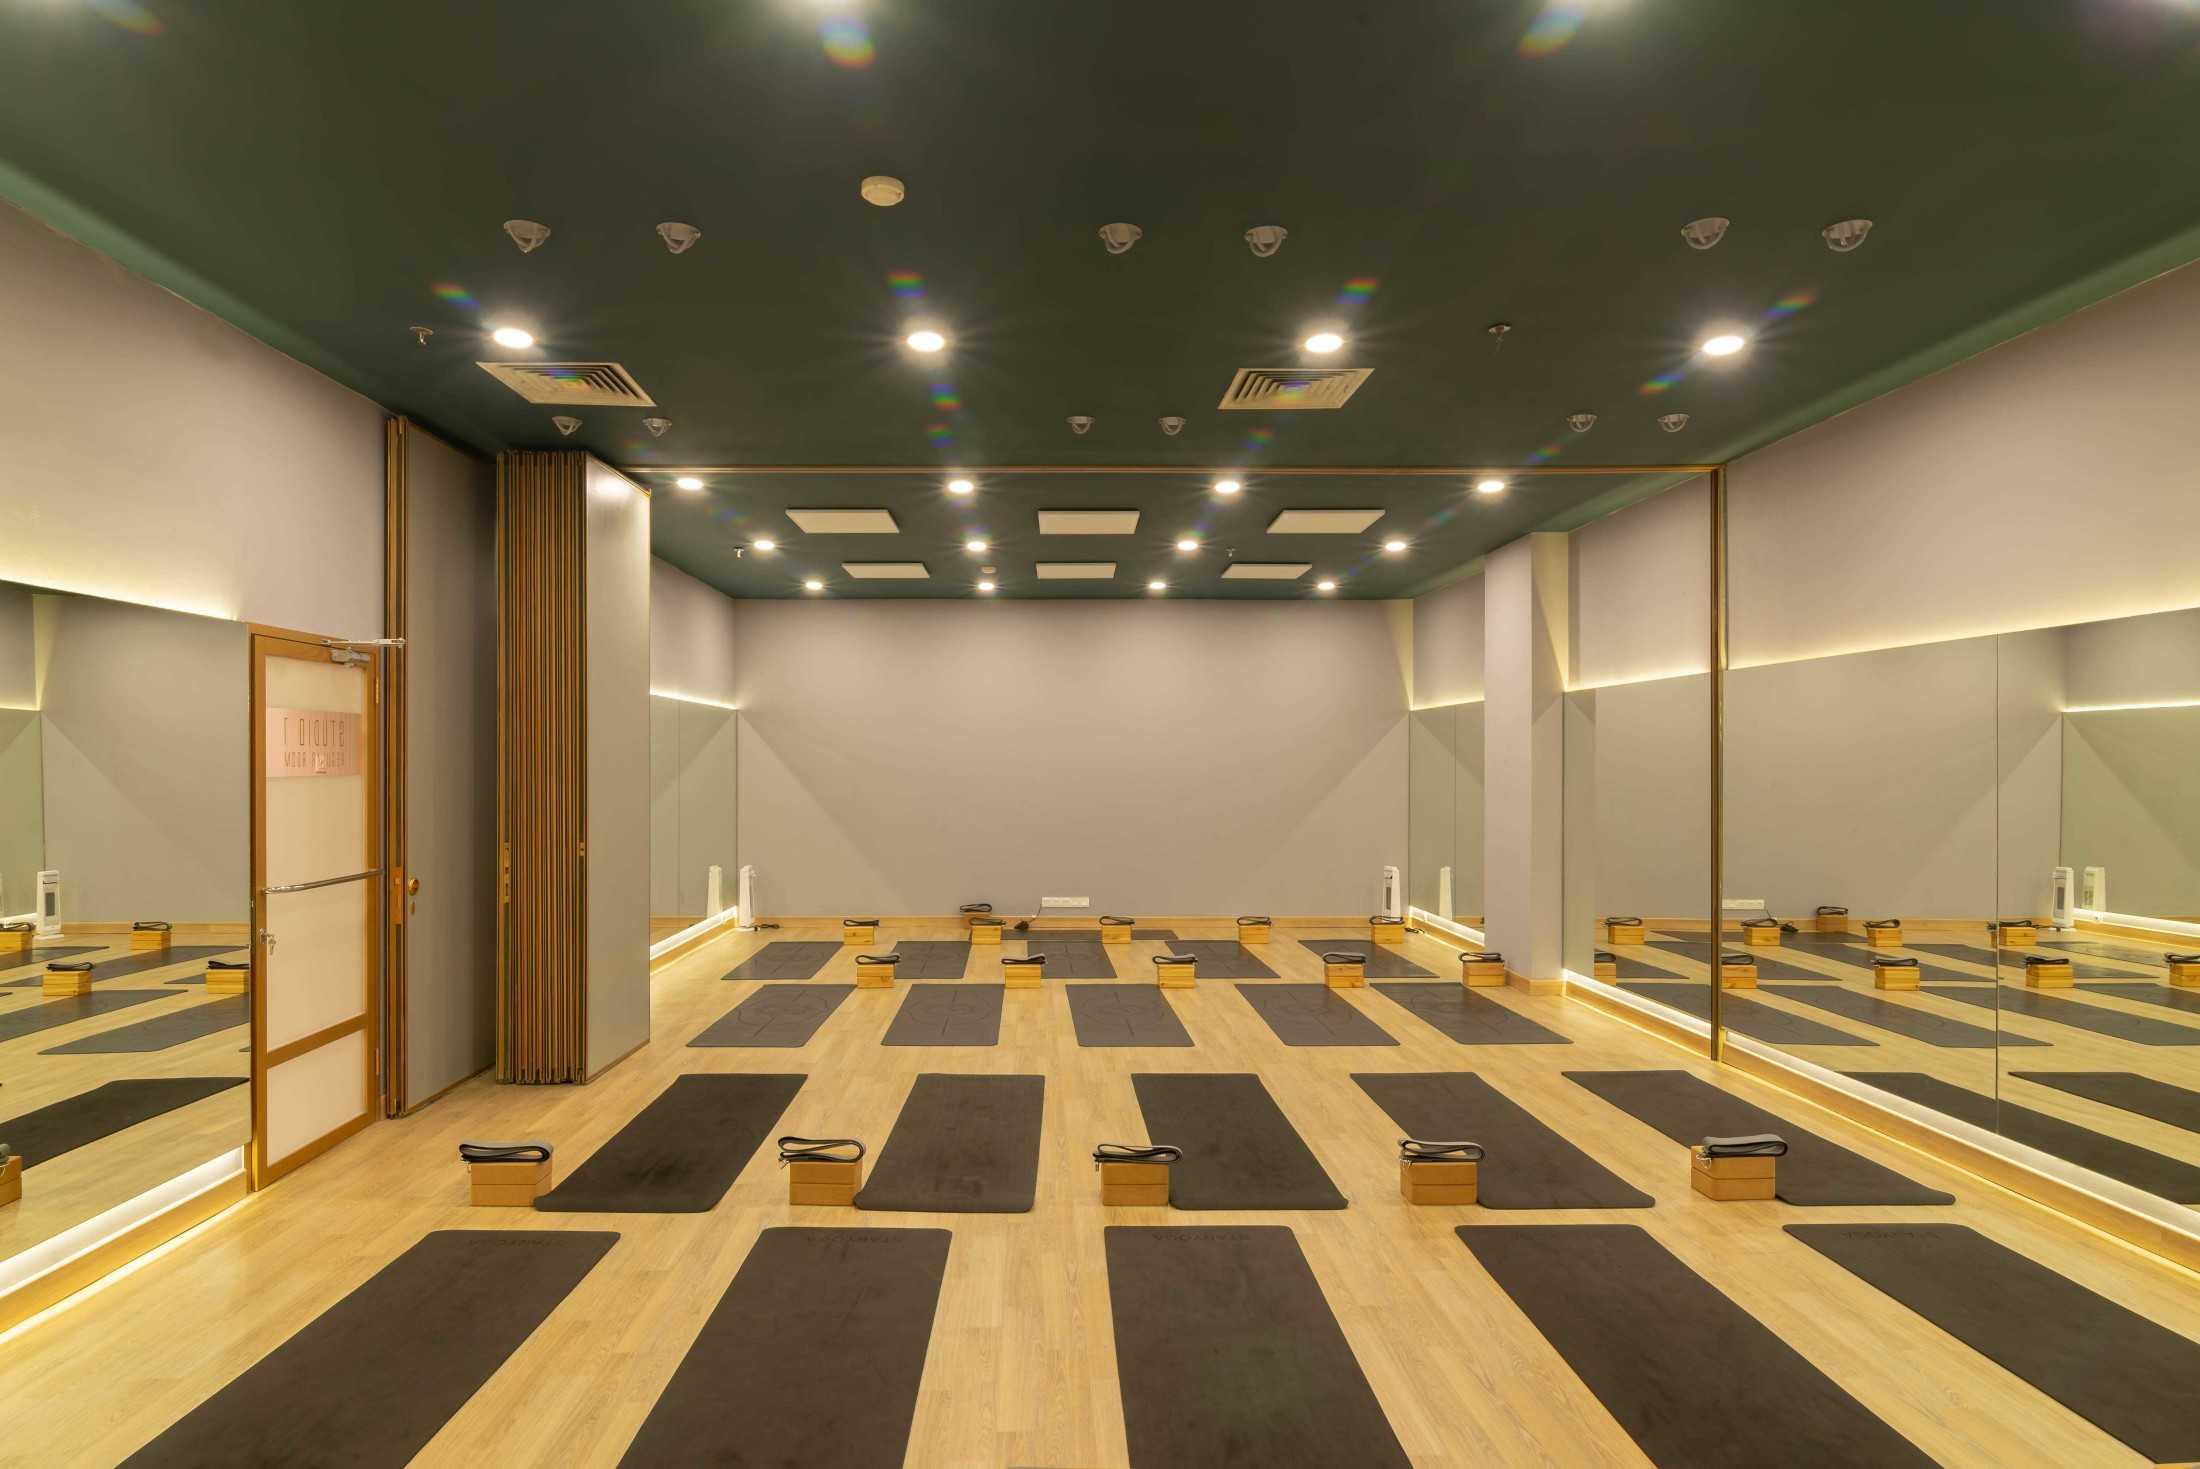 Archid Design&build Star Yoga Kec. Klp. Gading, Kota Jkt Utara, Daerah Khusus Ibukota Jakarta, Indonesia Kec. Klp. Gading, Kota Jkt Utara, Daerah Khusus Ibukota Jakarta, Indonesia Archid-Design-Build-Star-Yoga  88009